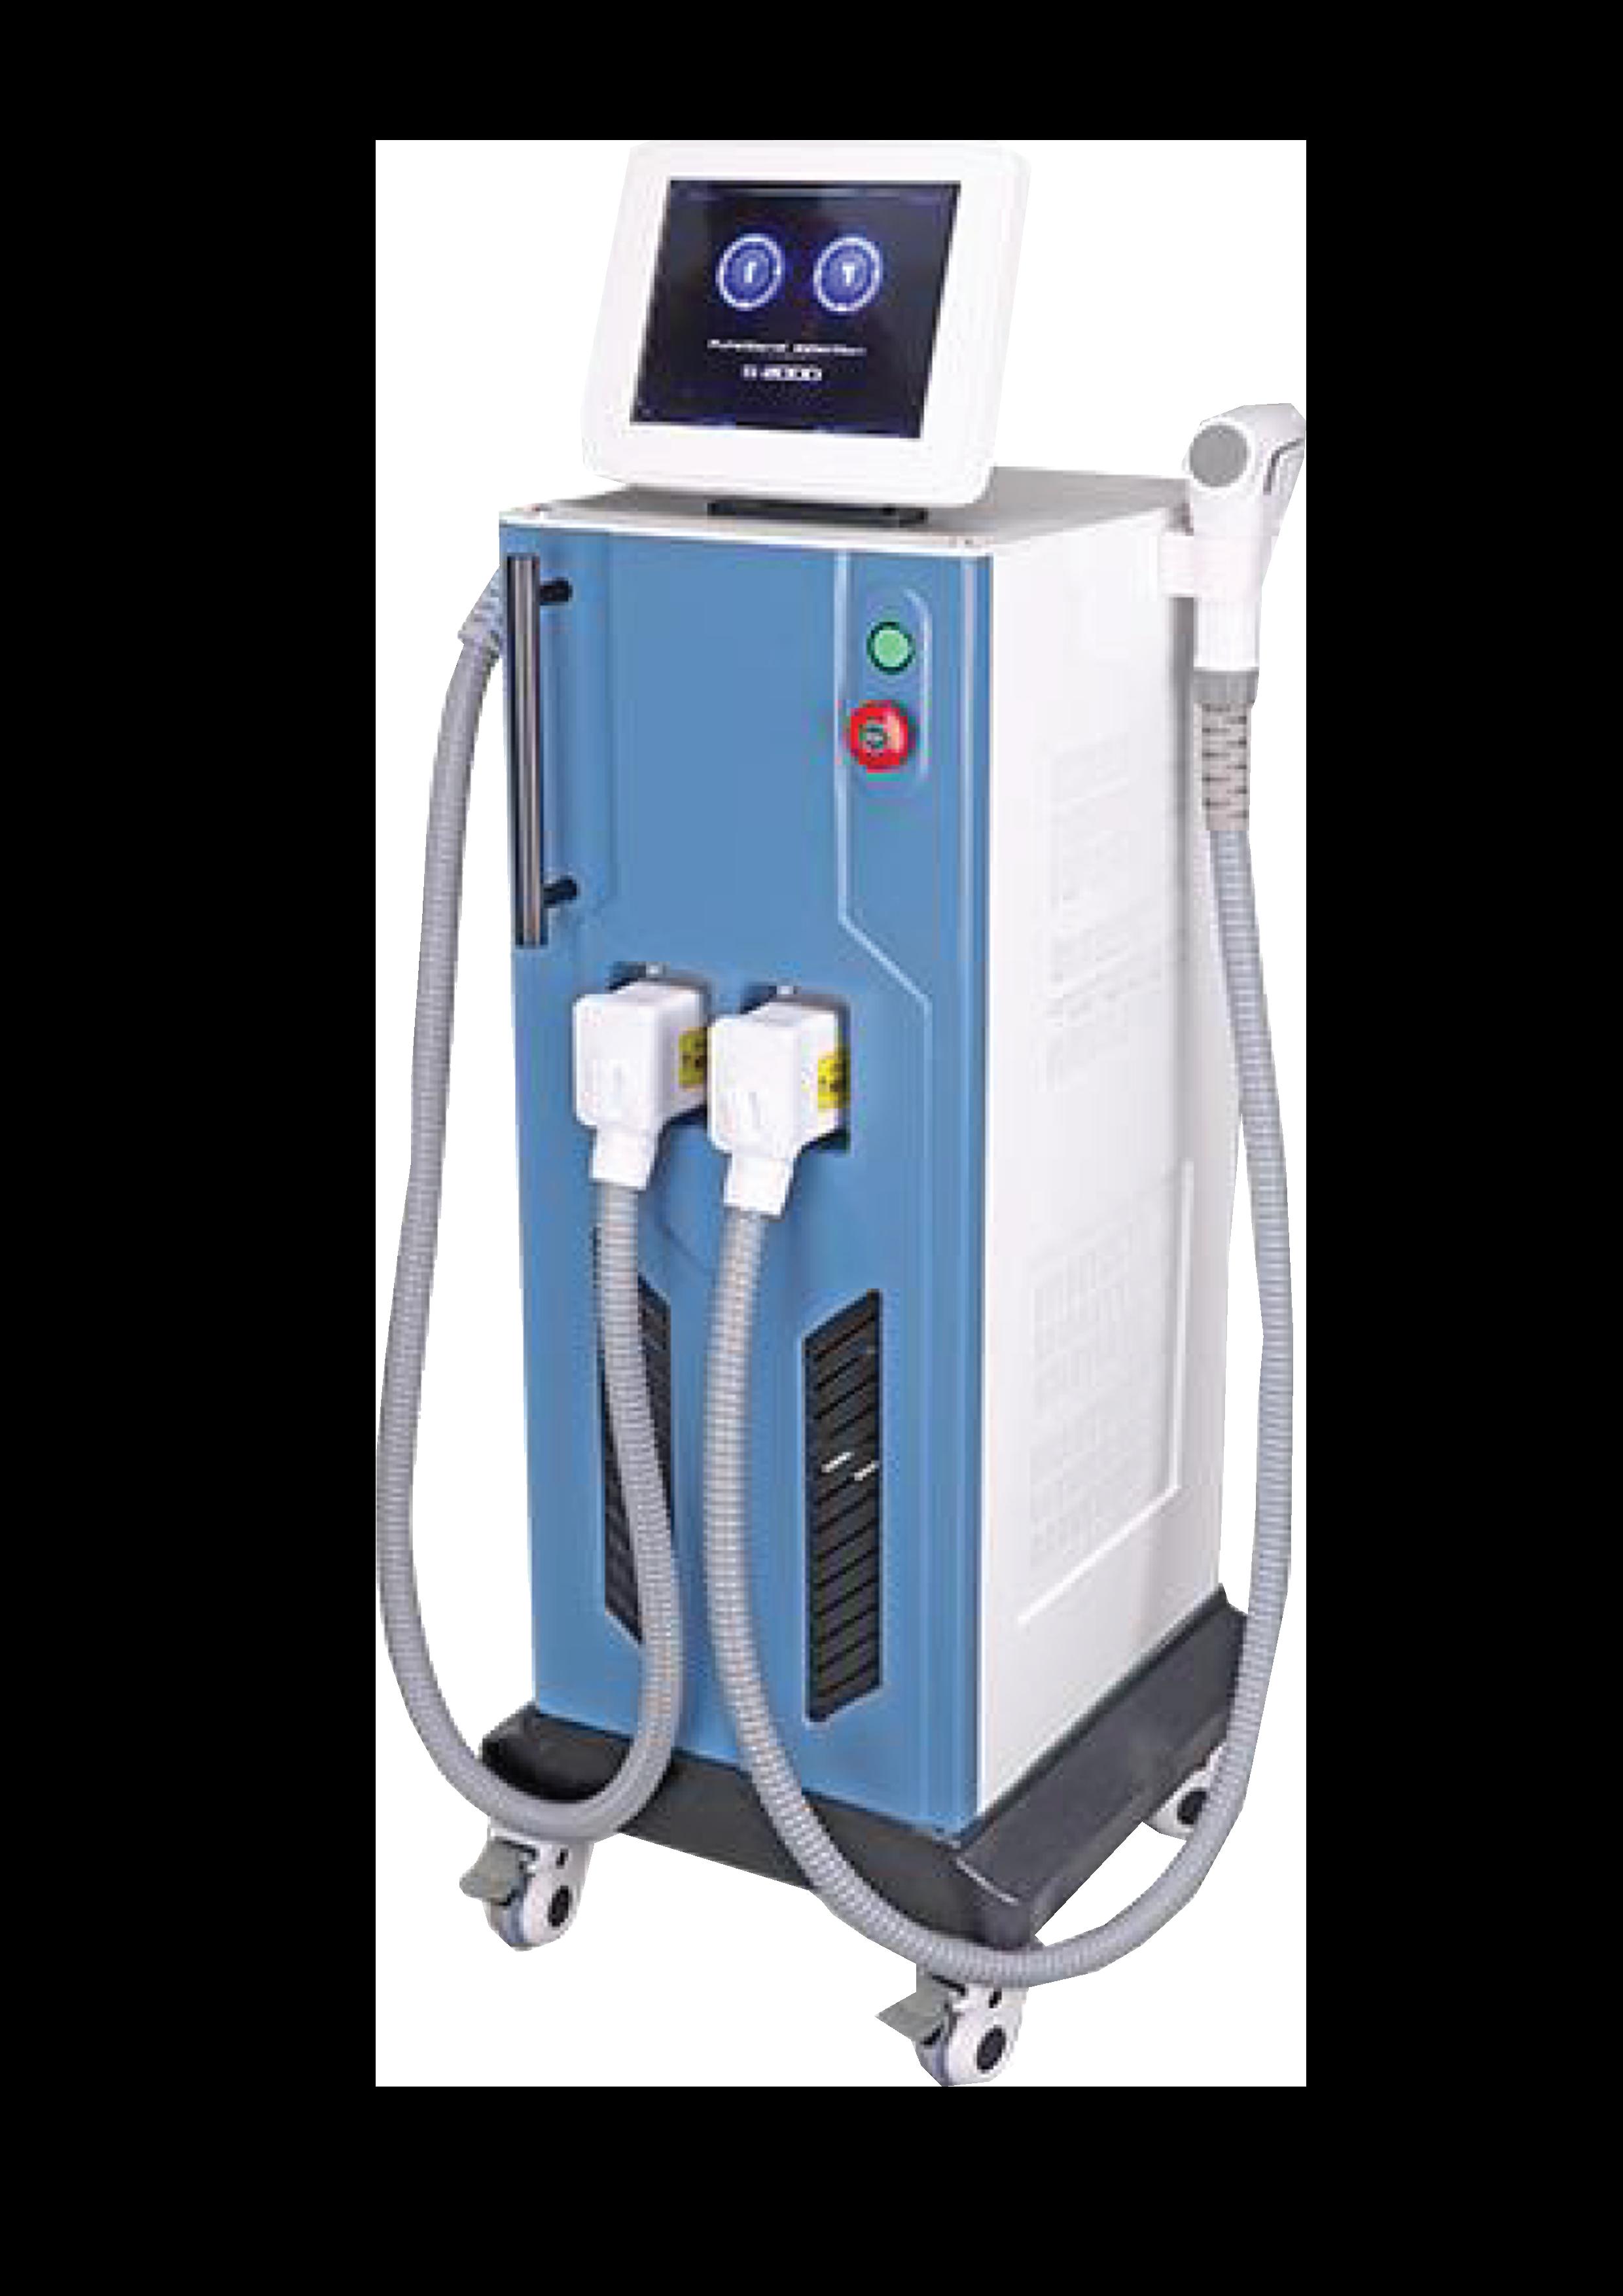 Diode & ND Yag laser Machine